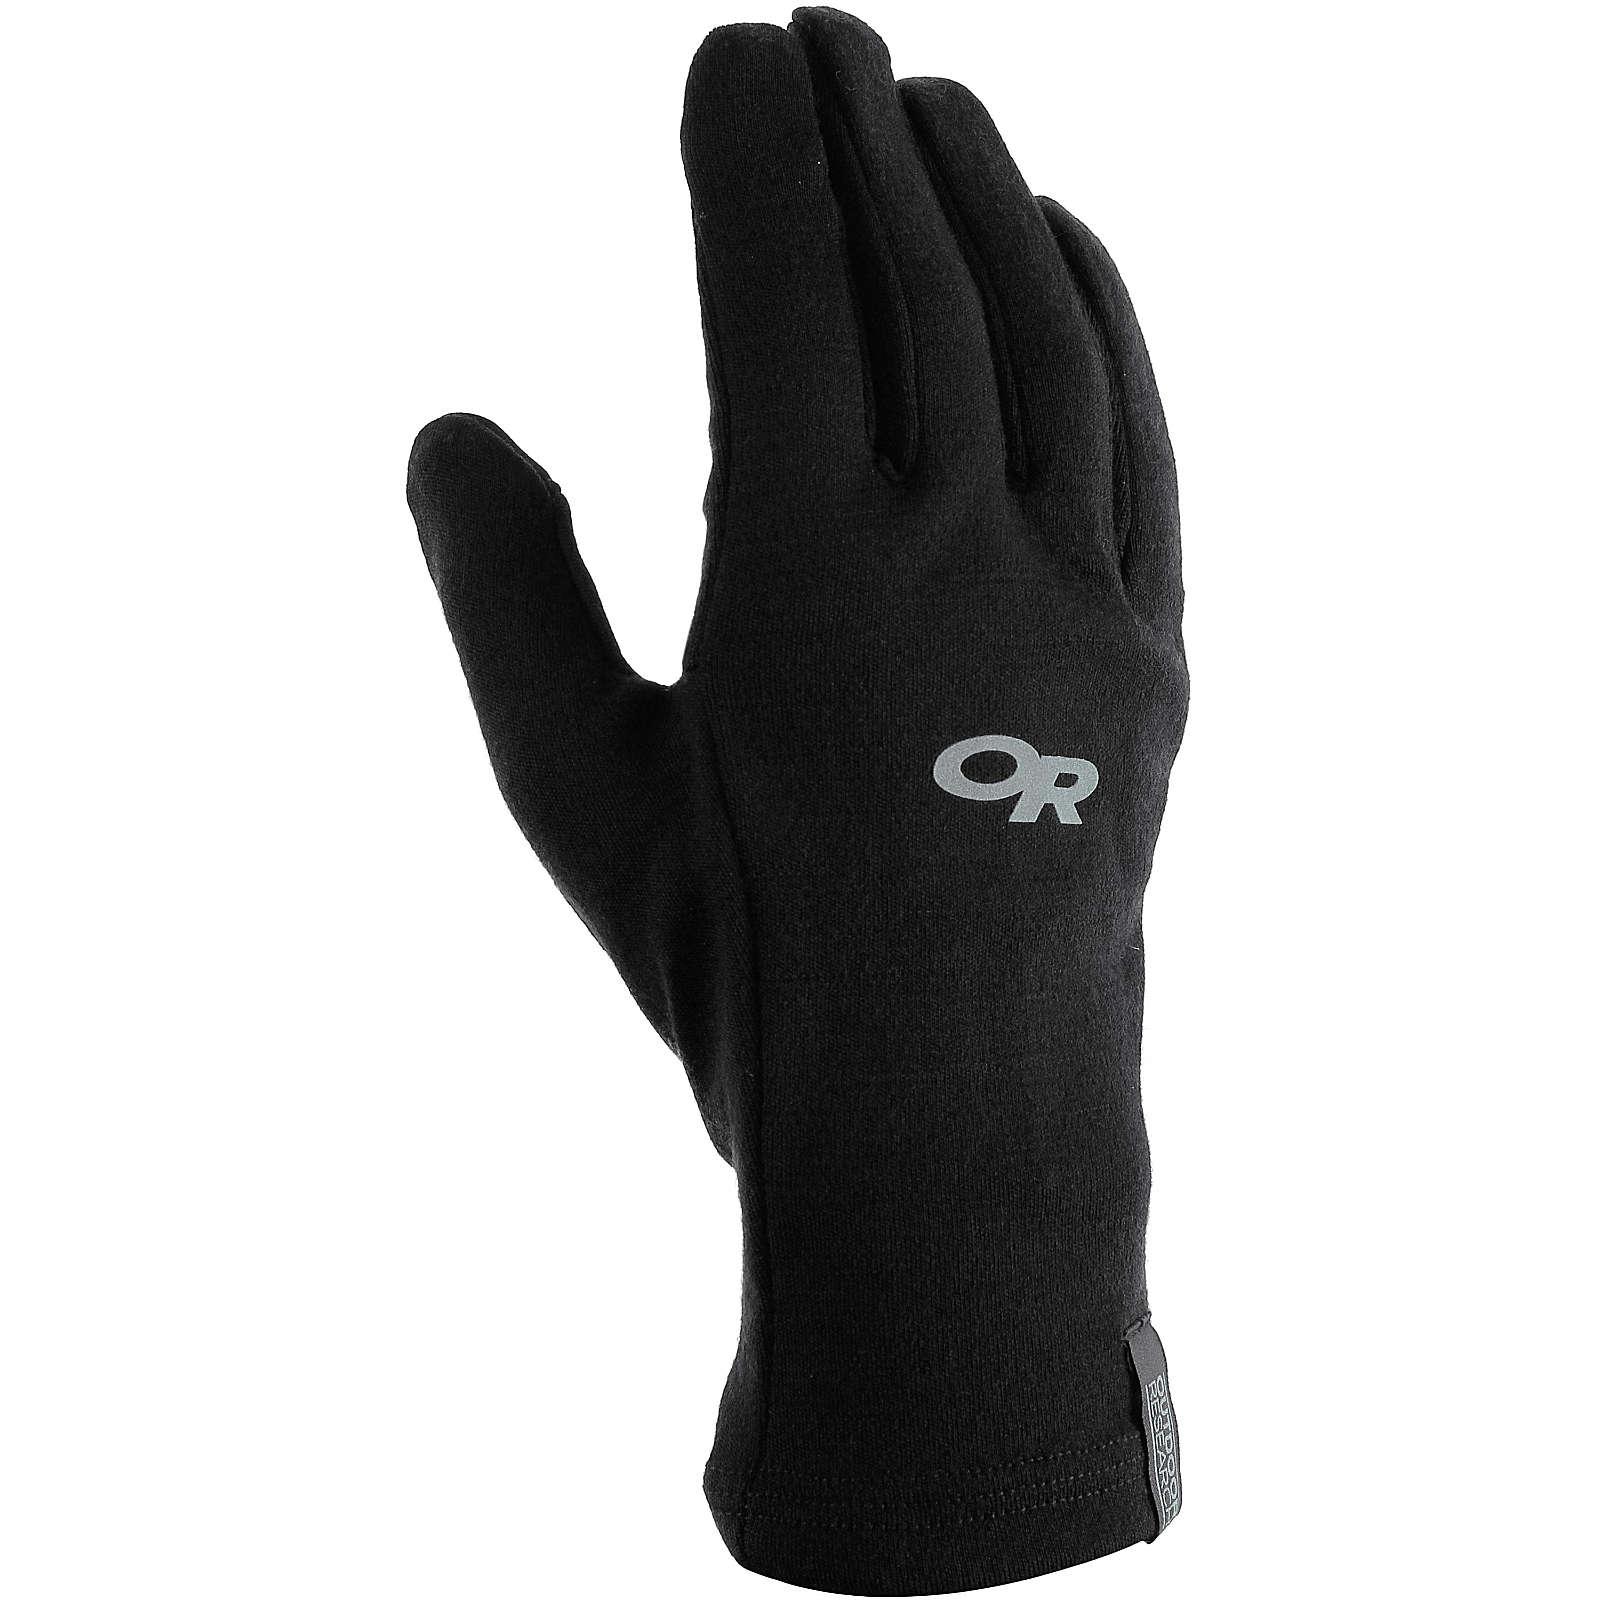 Outdoor Research Outdoorhandschuhe Wooly Sensor Liners Fingerhandschuhe schwarz Damen